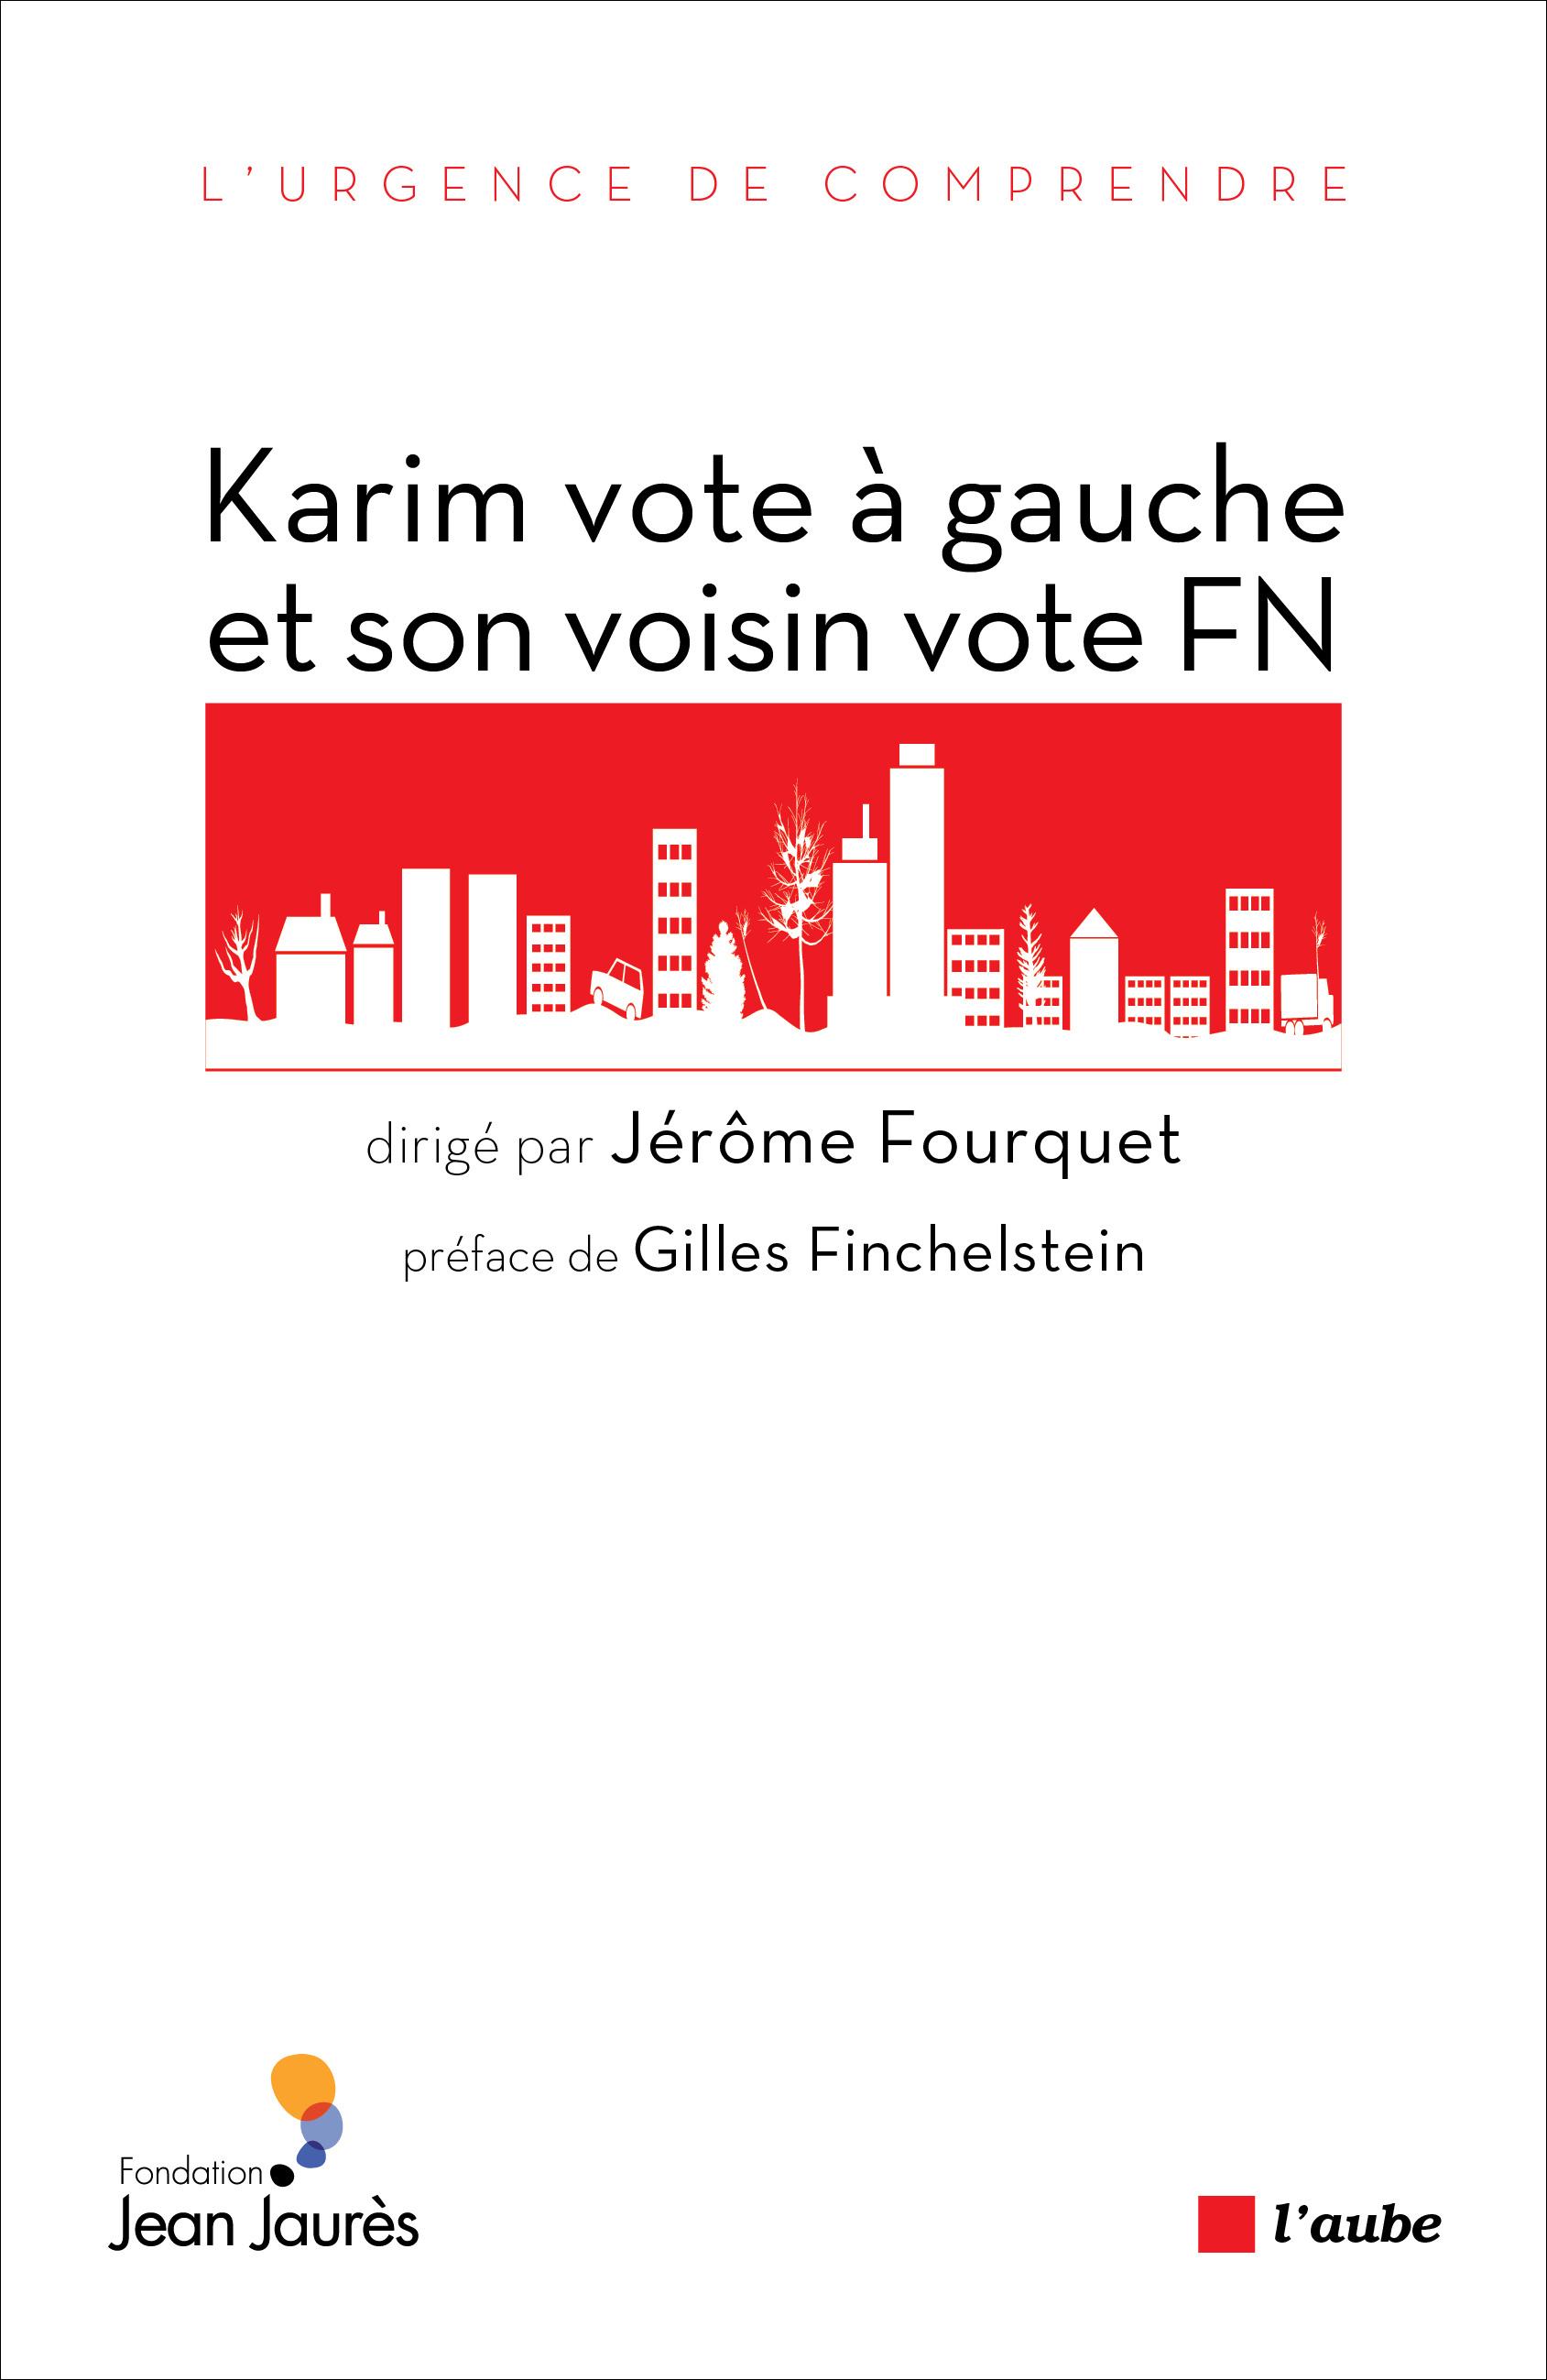 KARIM VOTE A GAUCHE ET SON VOISIN VOTE FN